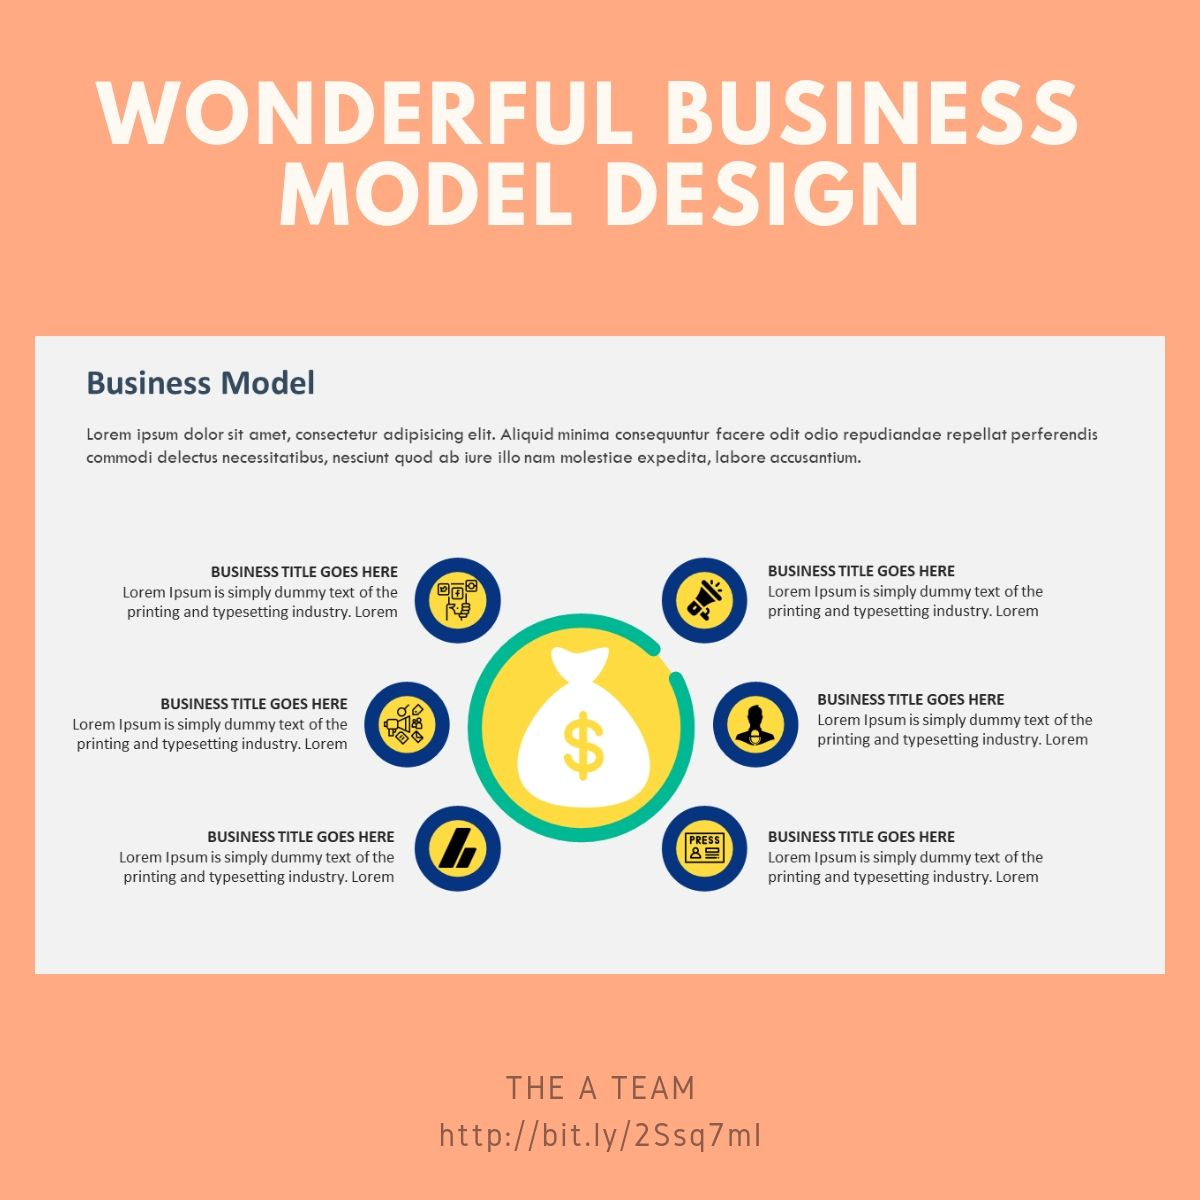 Wonderful business model slide and template design